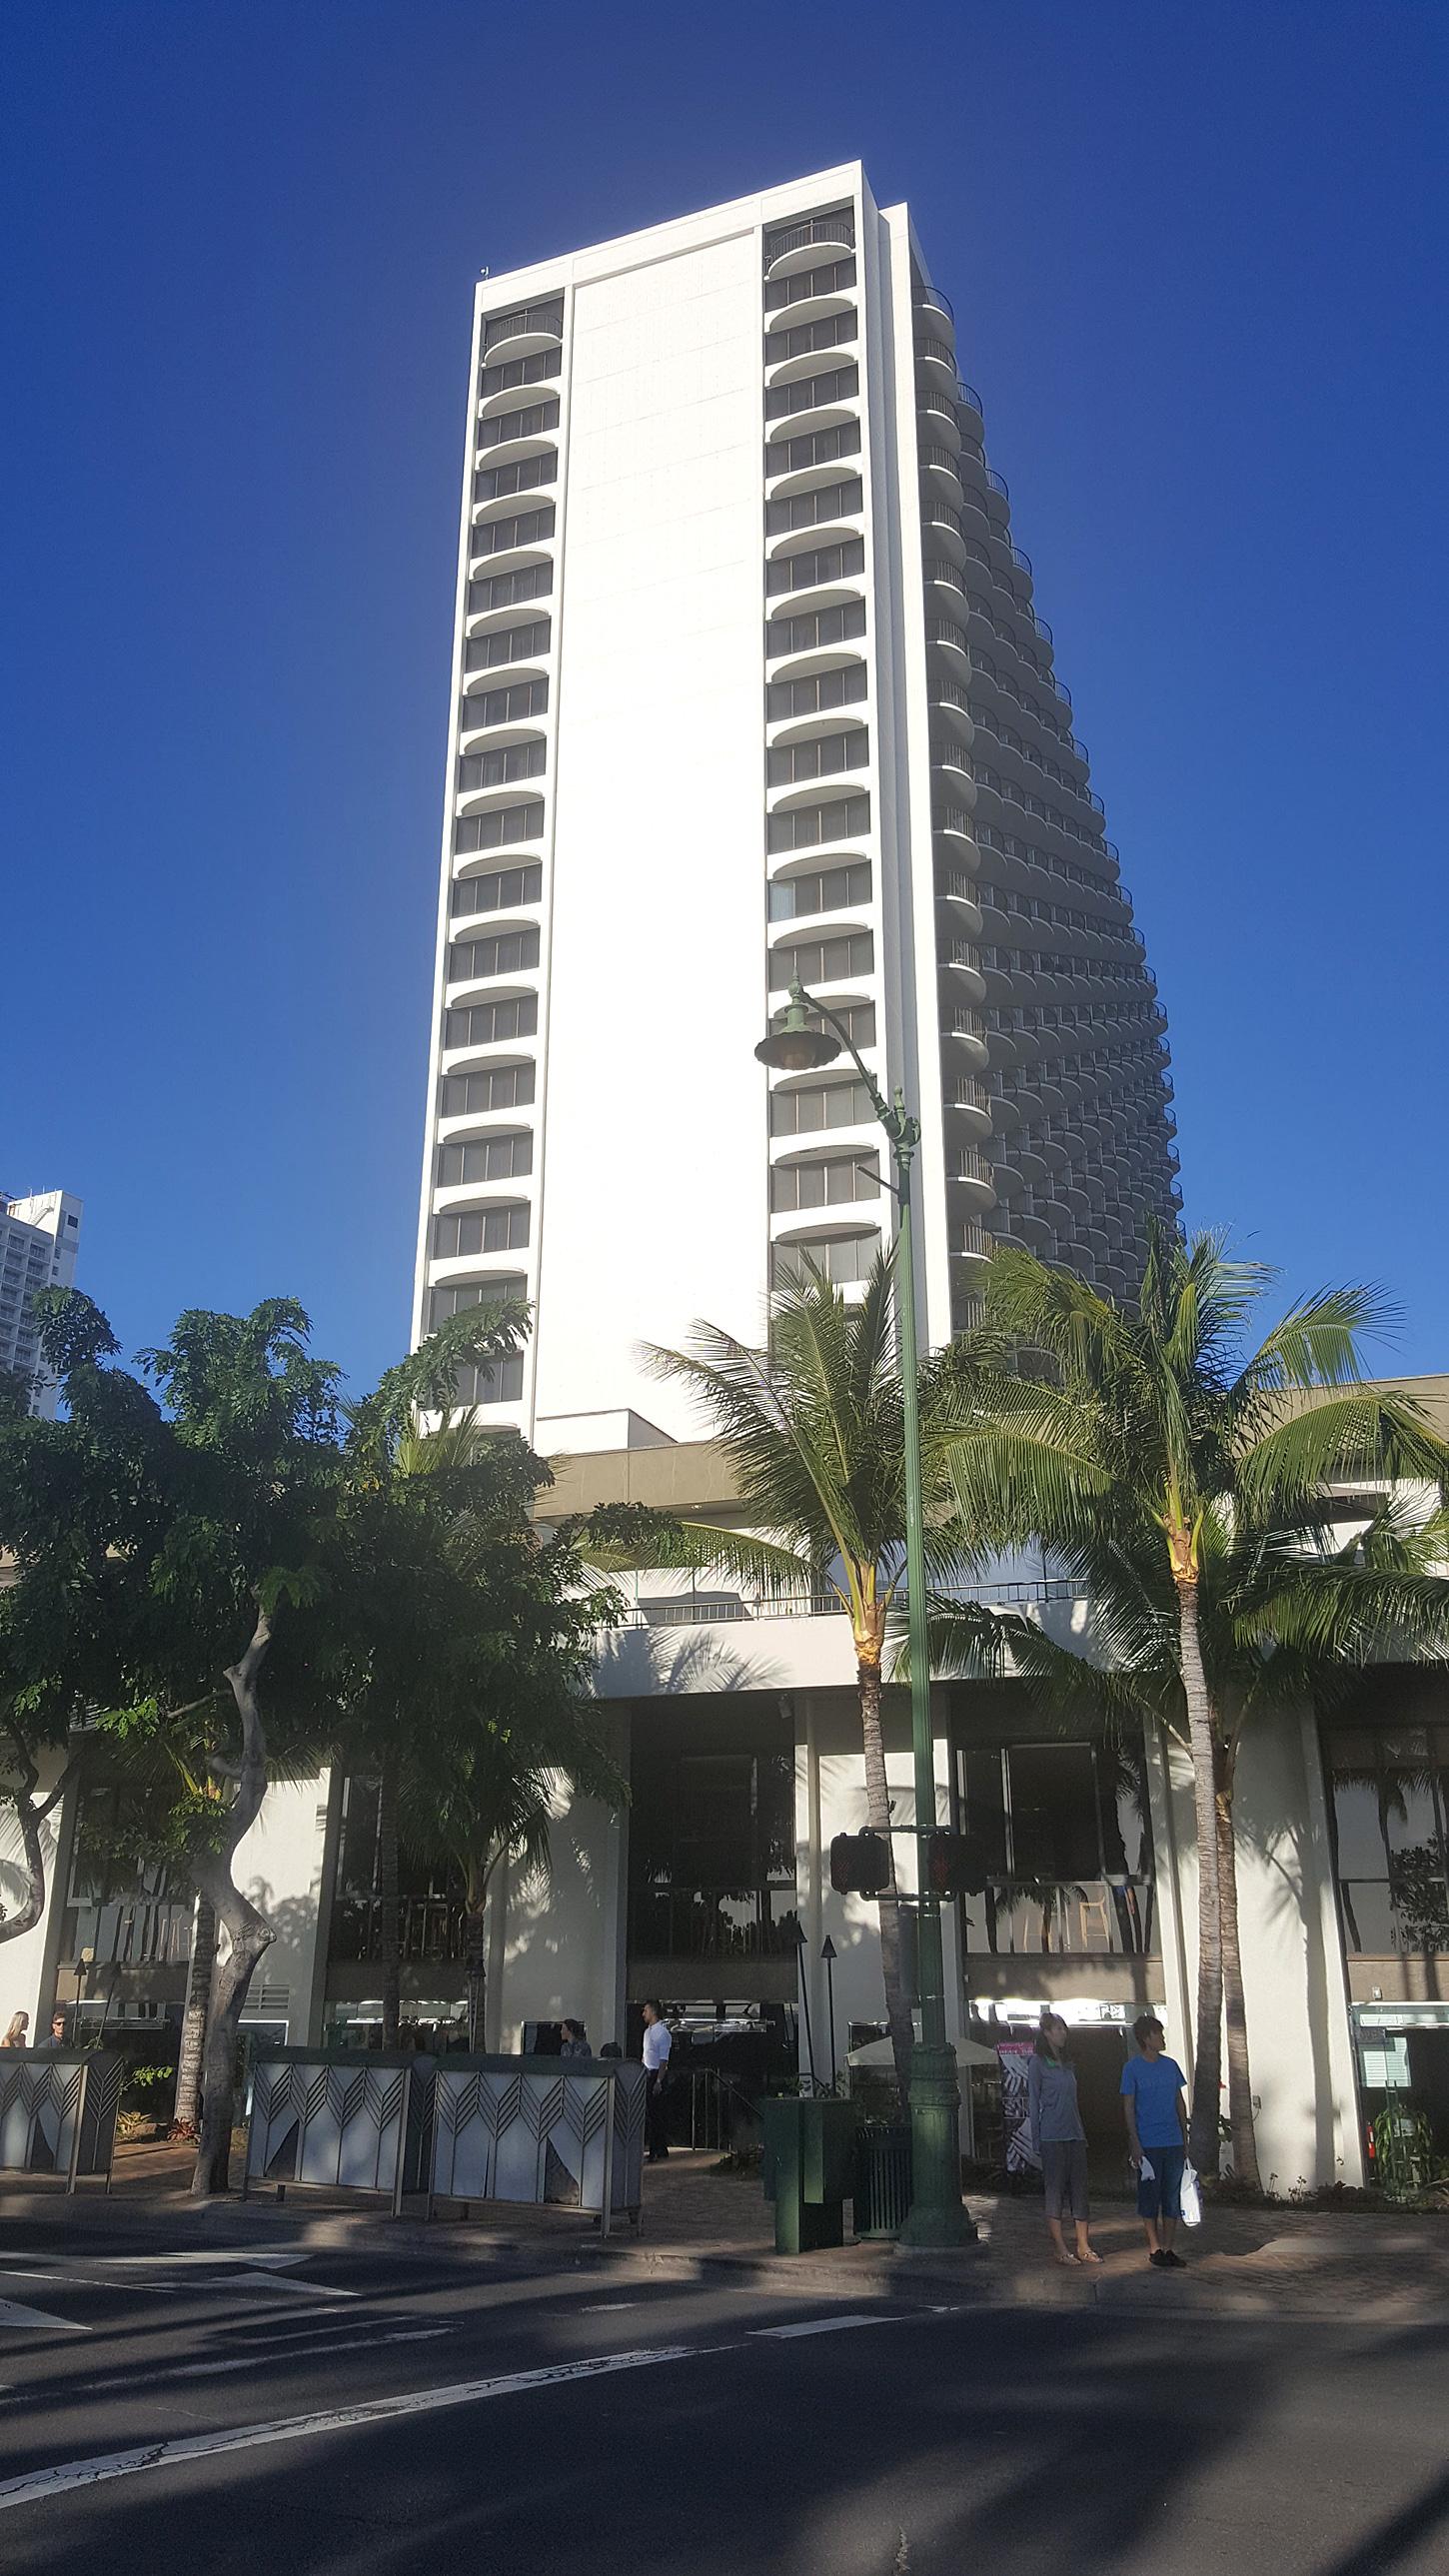 Kuhio Beach Grill at the Waikiki Marriott Celebrates Grand